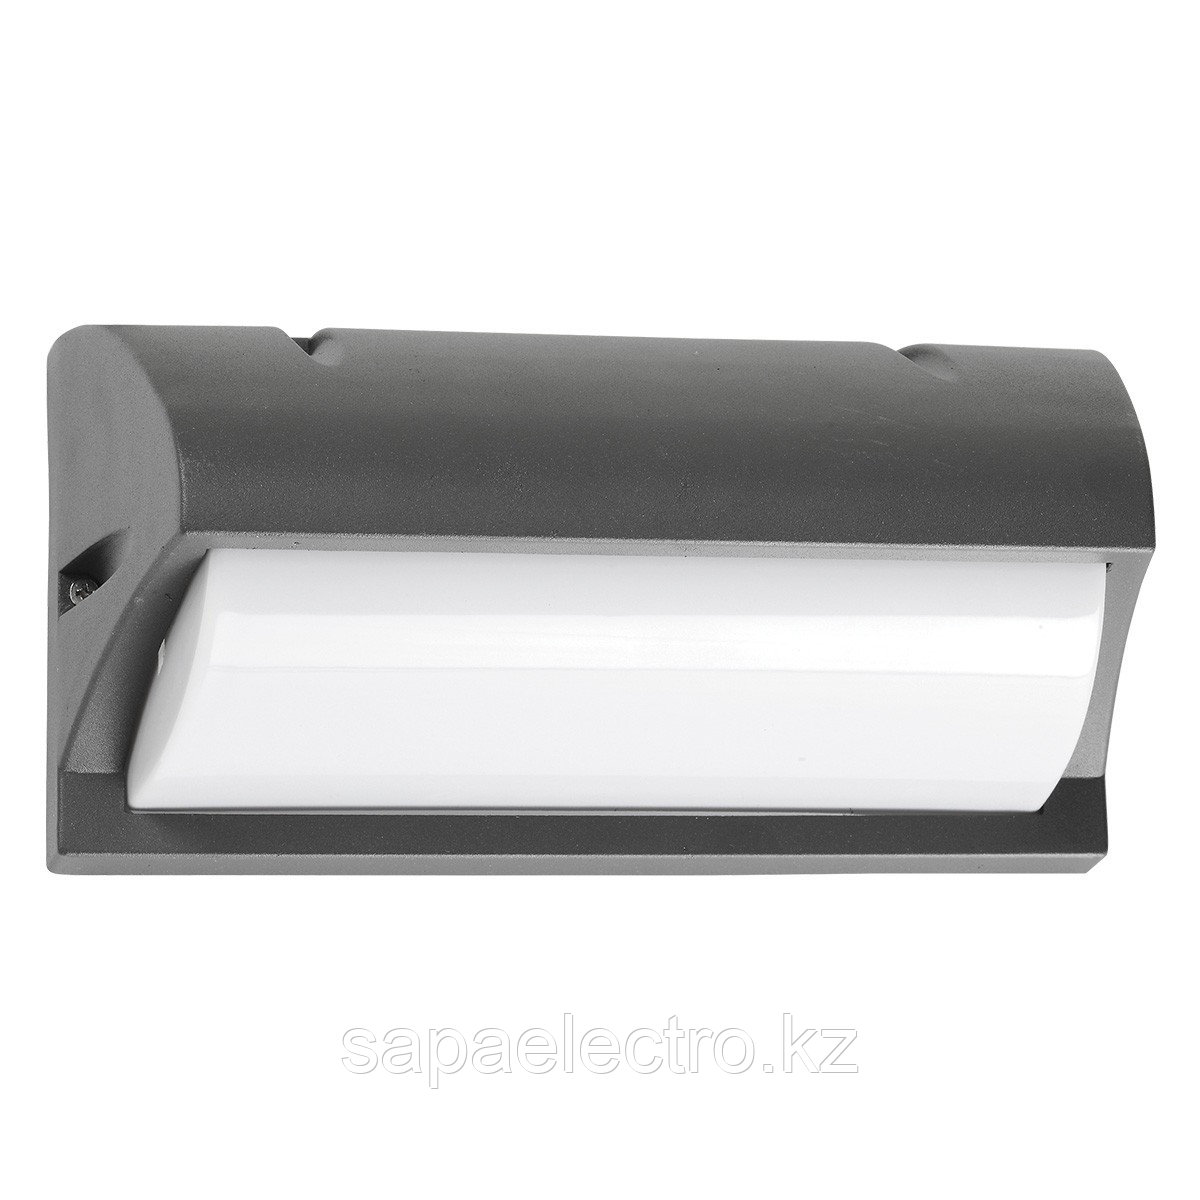 Свет-к LED C3110 10W GREY 5000K (TEKSAN) 10шт